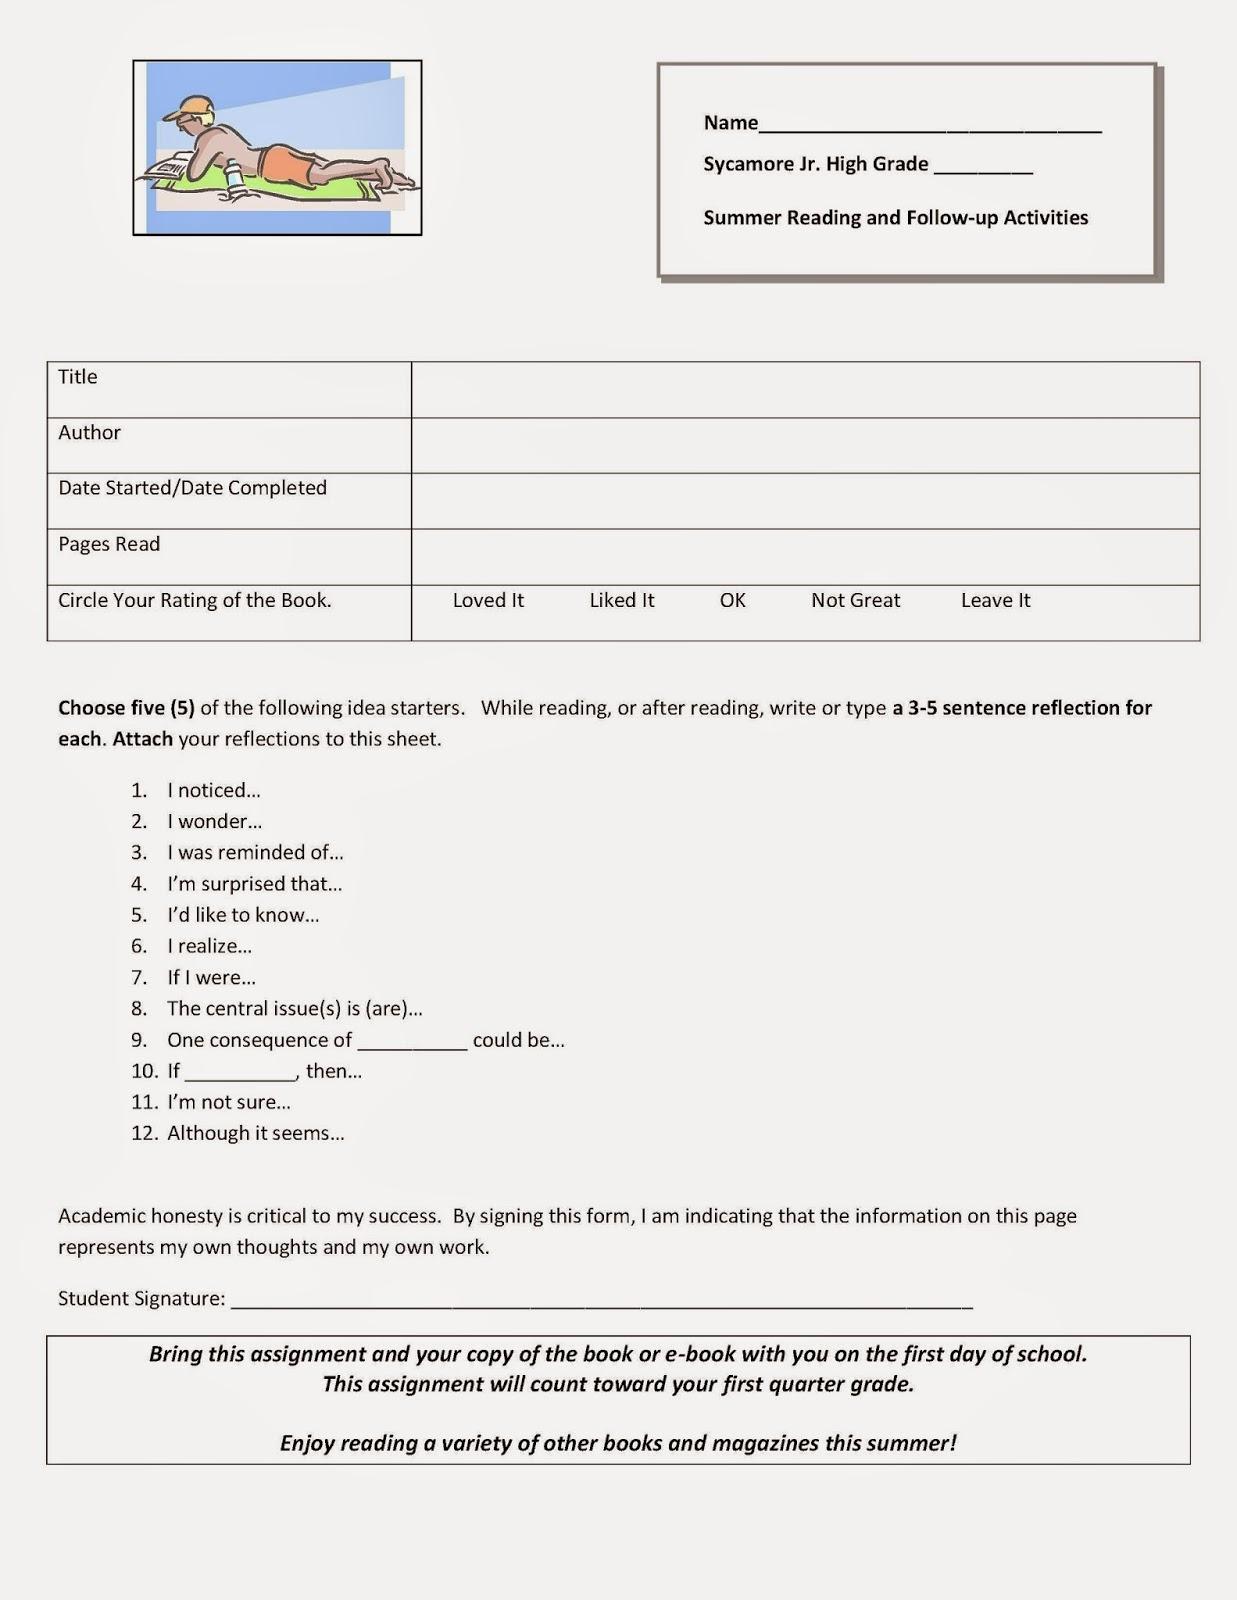 Sycamore Junior High Newsletter Summer Reading